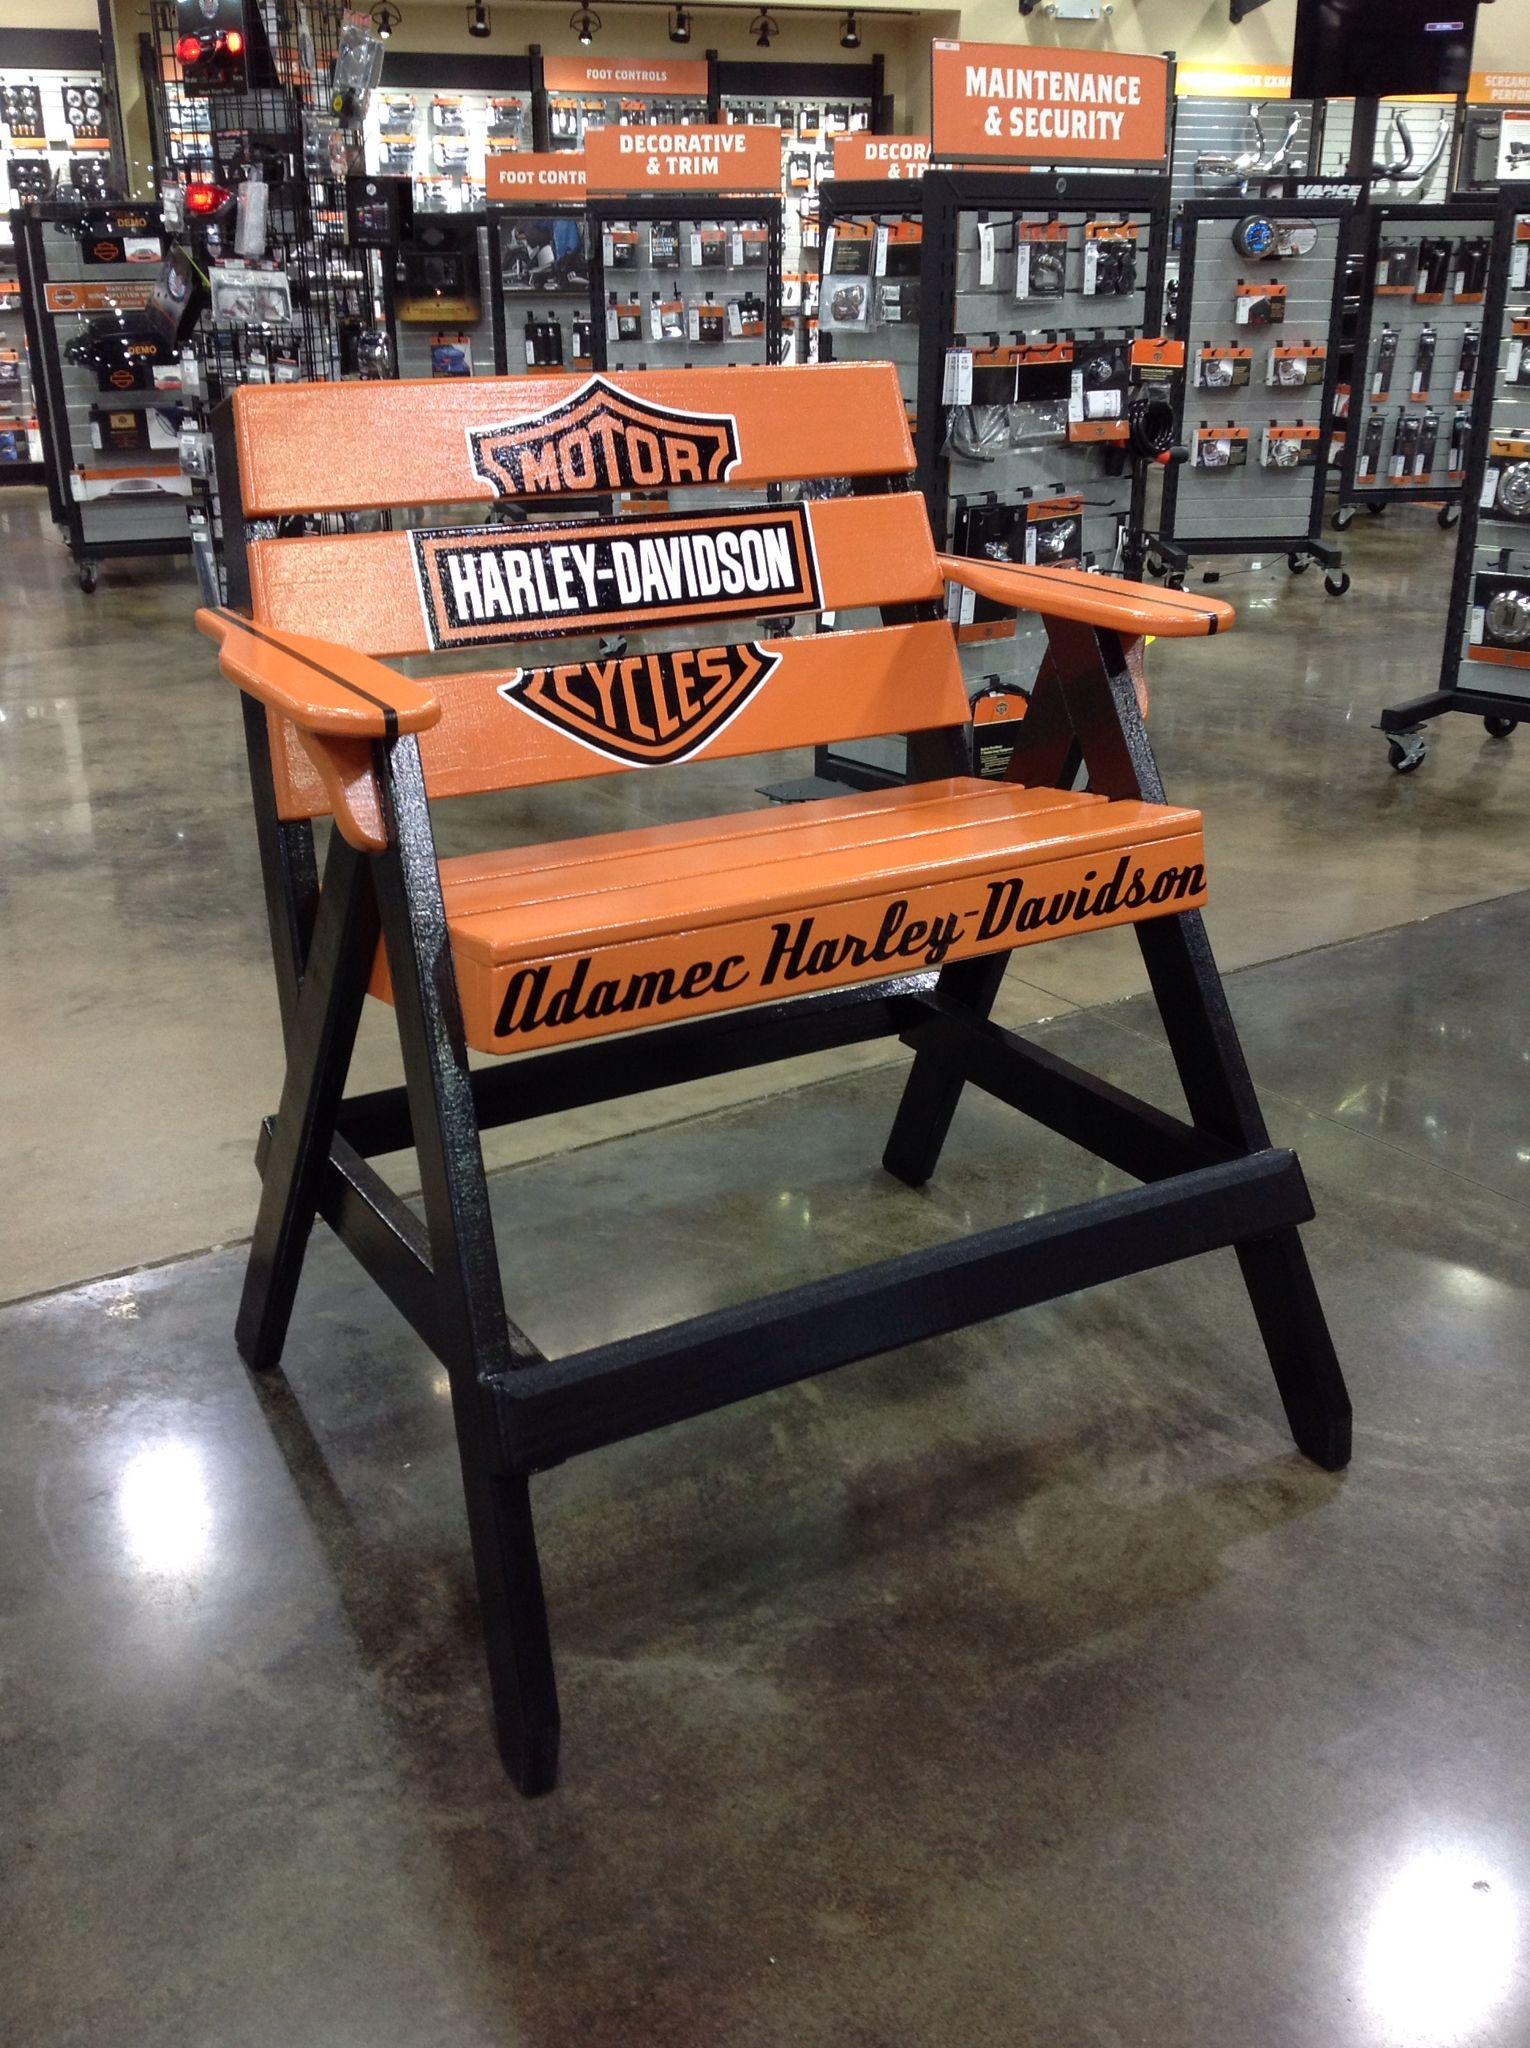 how to build a lifeguard chair swivel amazon uk custom built adamec harley davidson